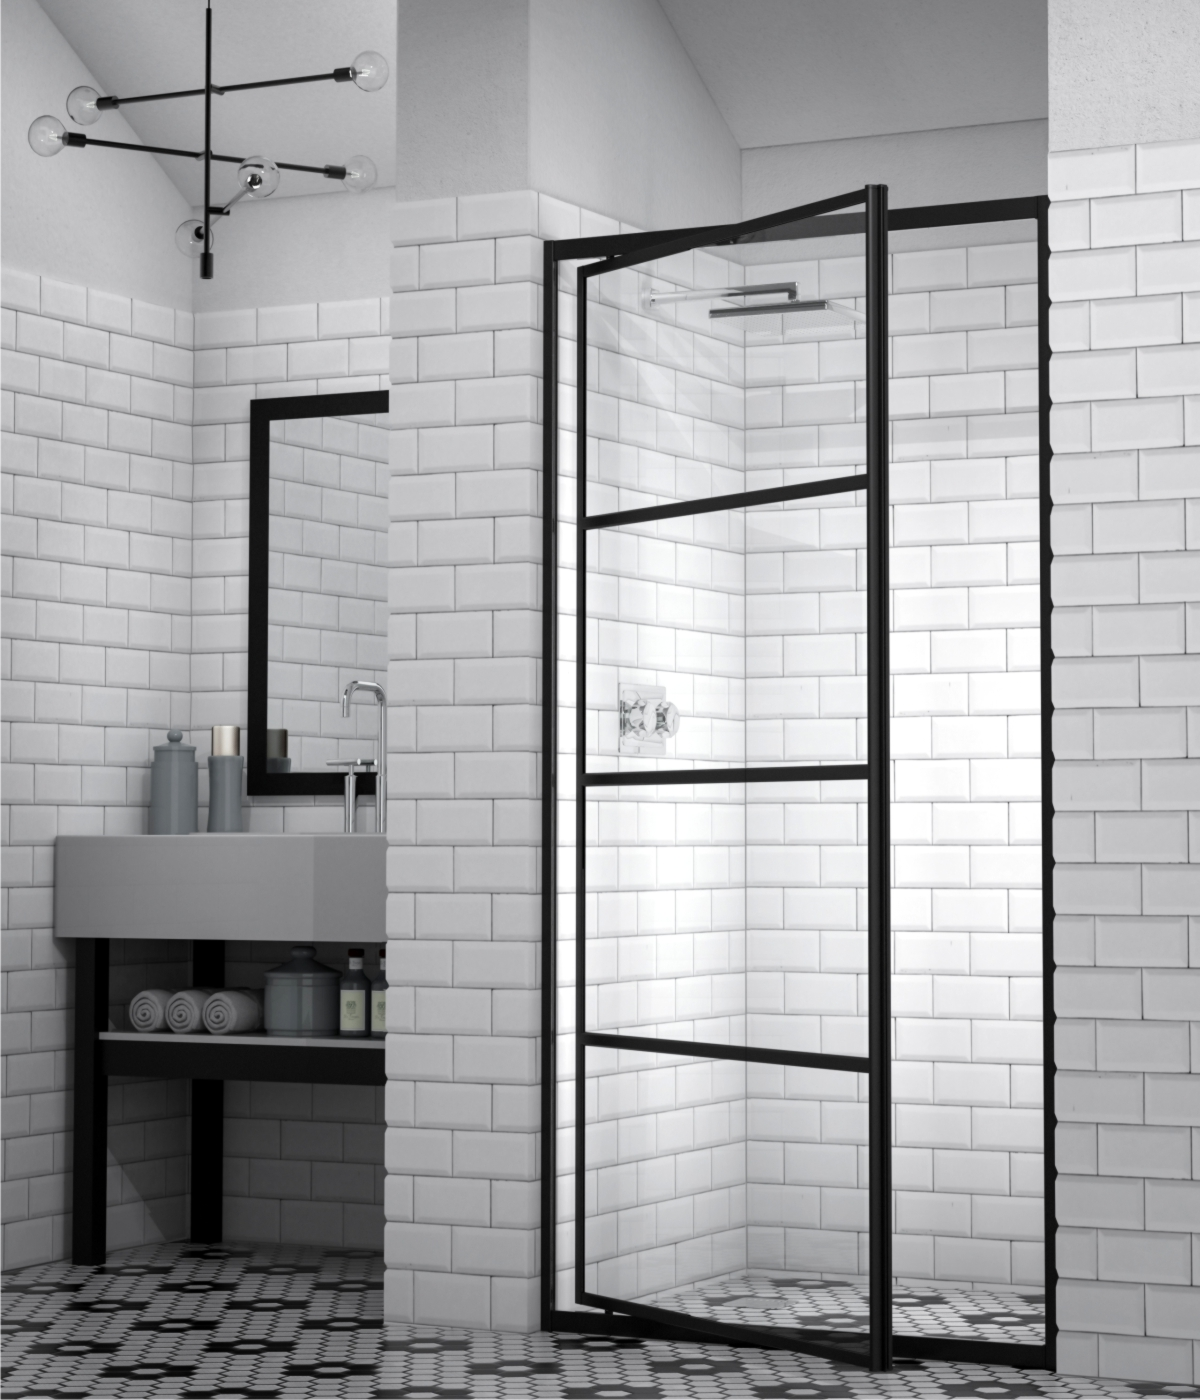 Market Favourite Silhouette Framed Shower Doors Showerline